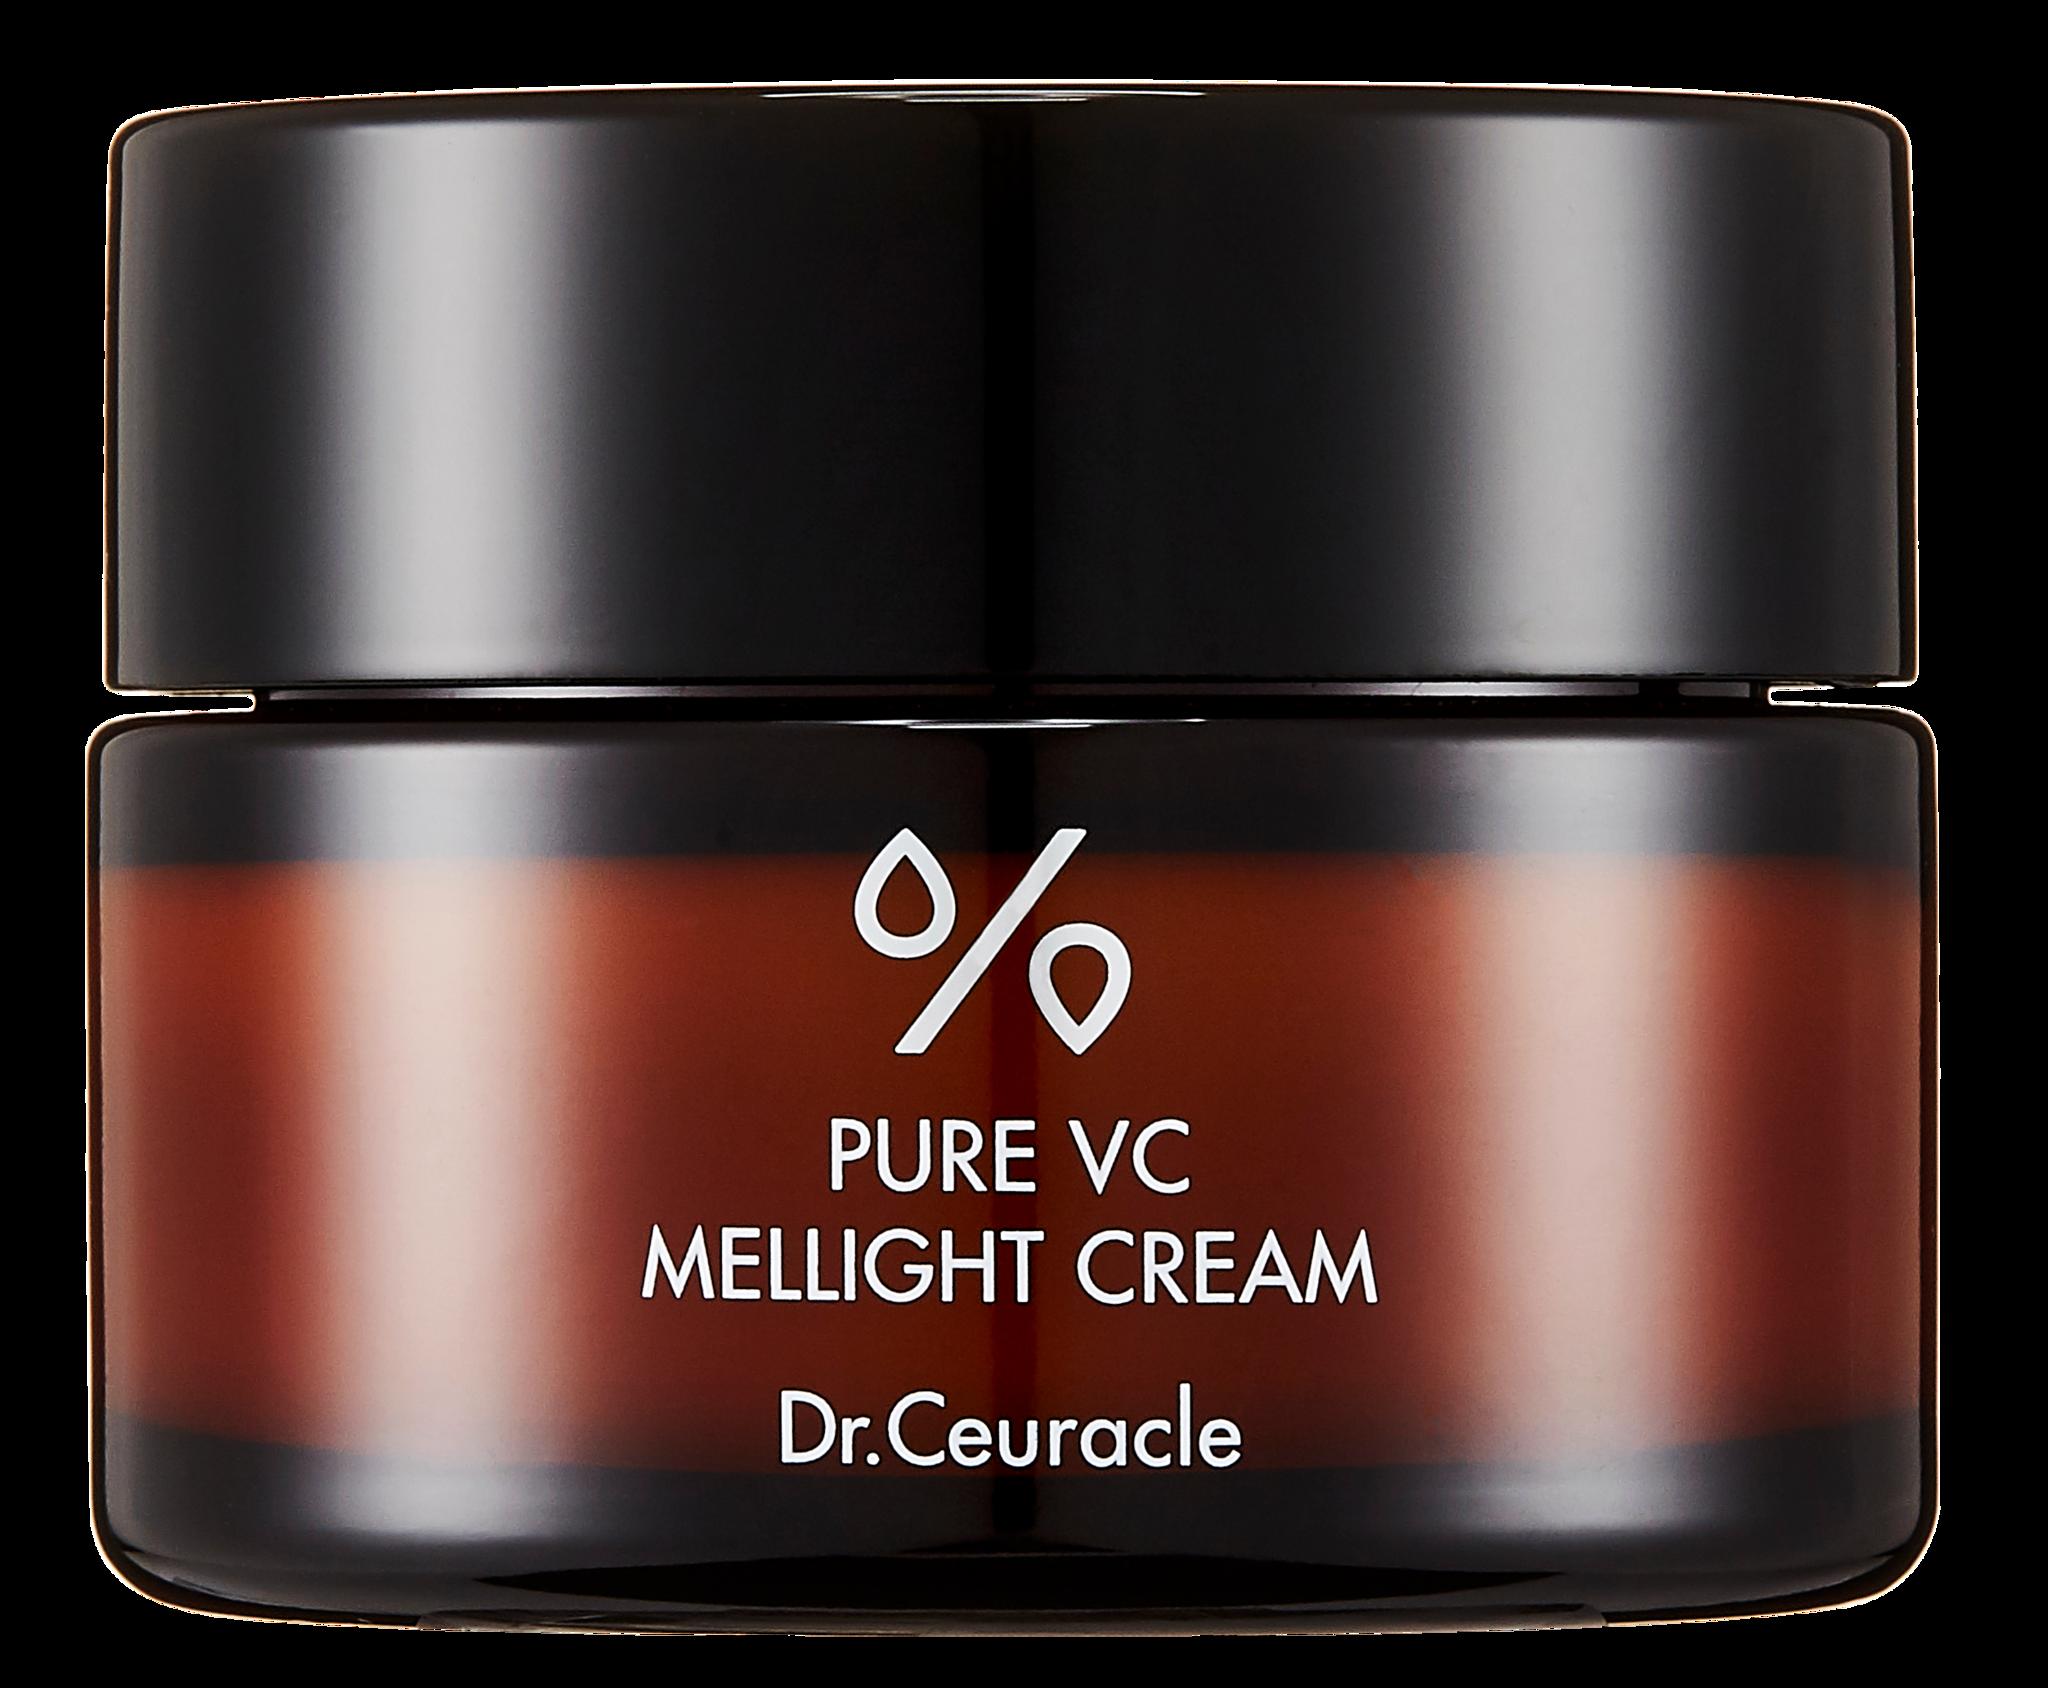 Крем с 10% Порошком Витамина С Dr.Ceuracle Pure VC Mellight Cream